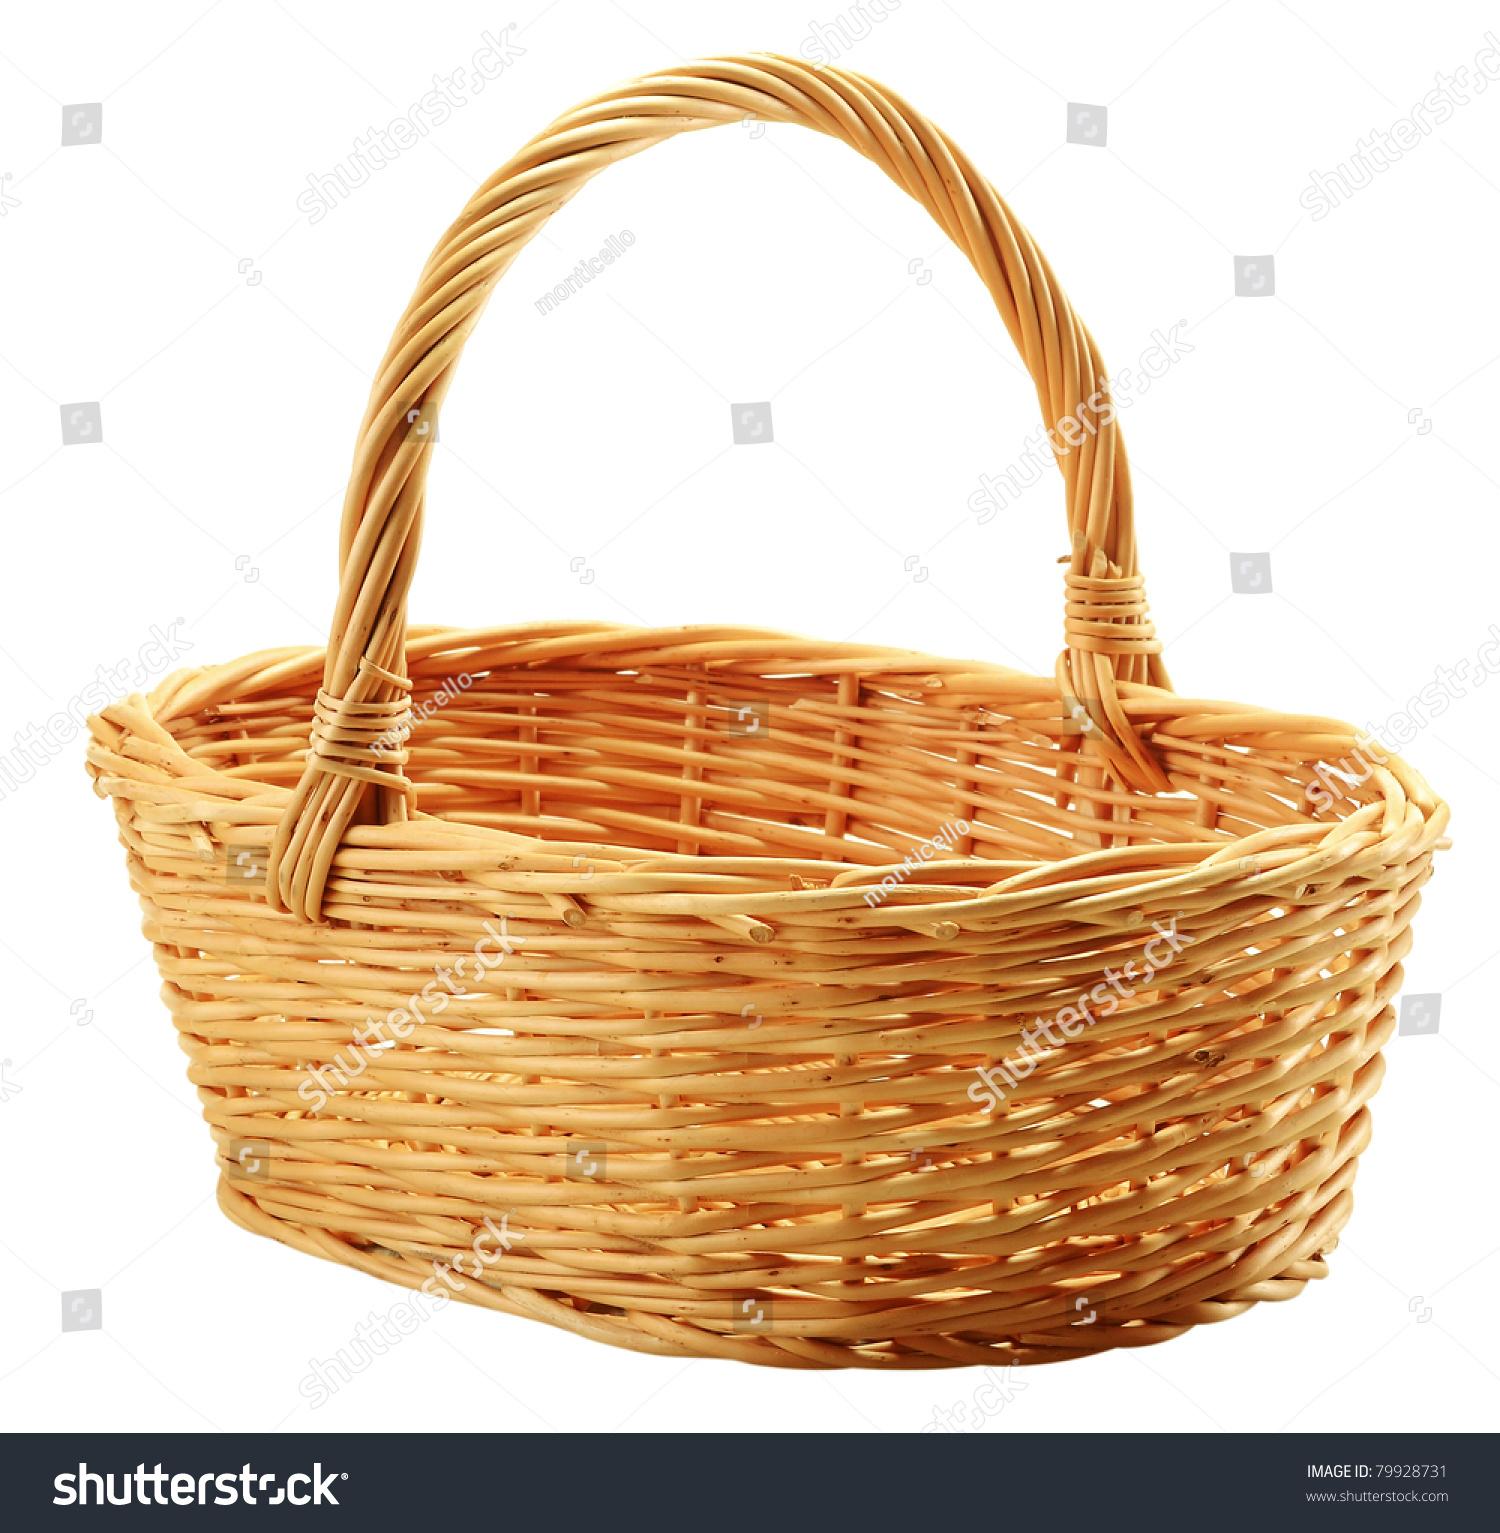 Empty Wicker Basket Isolated On White Stock Photo 79928731